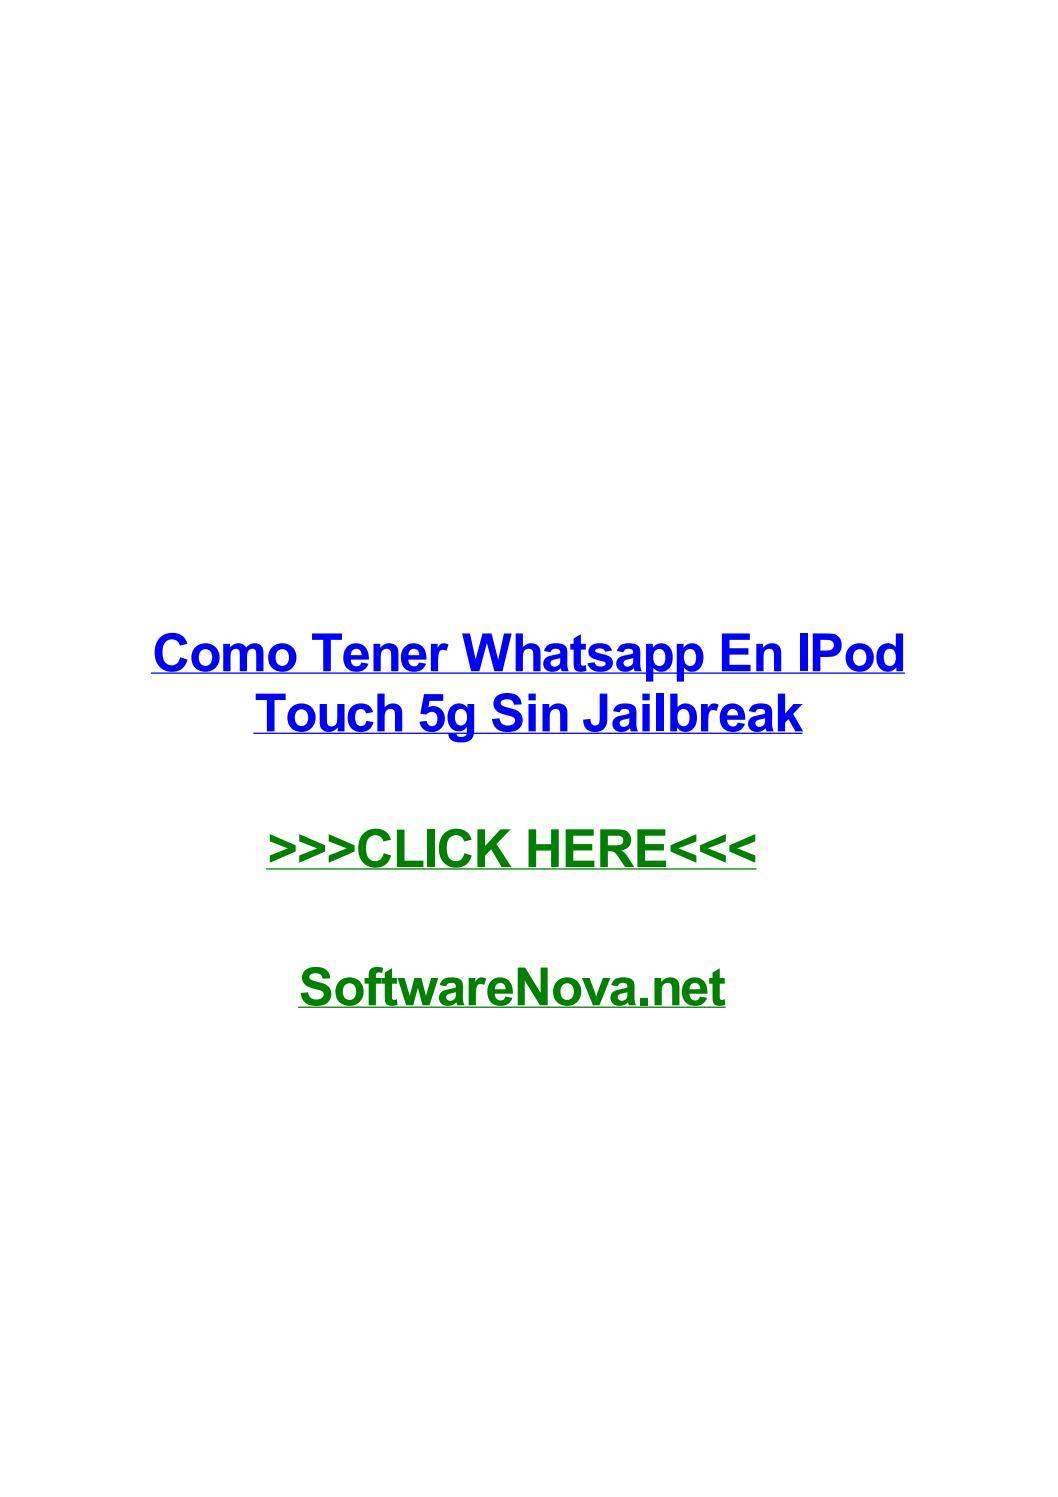 Como Tener Whatsapp En Ipod Touch 5g Sin Jailbreak By